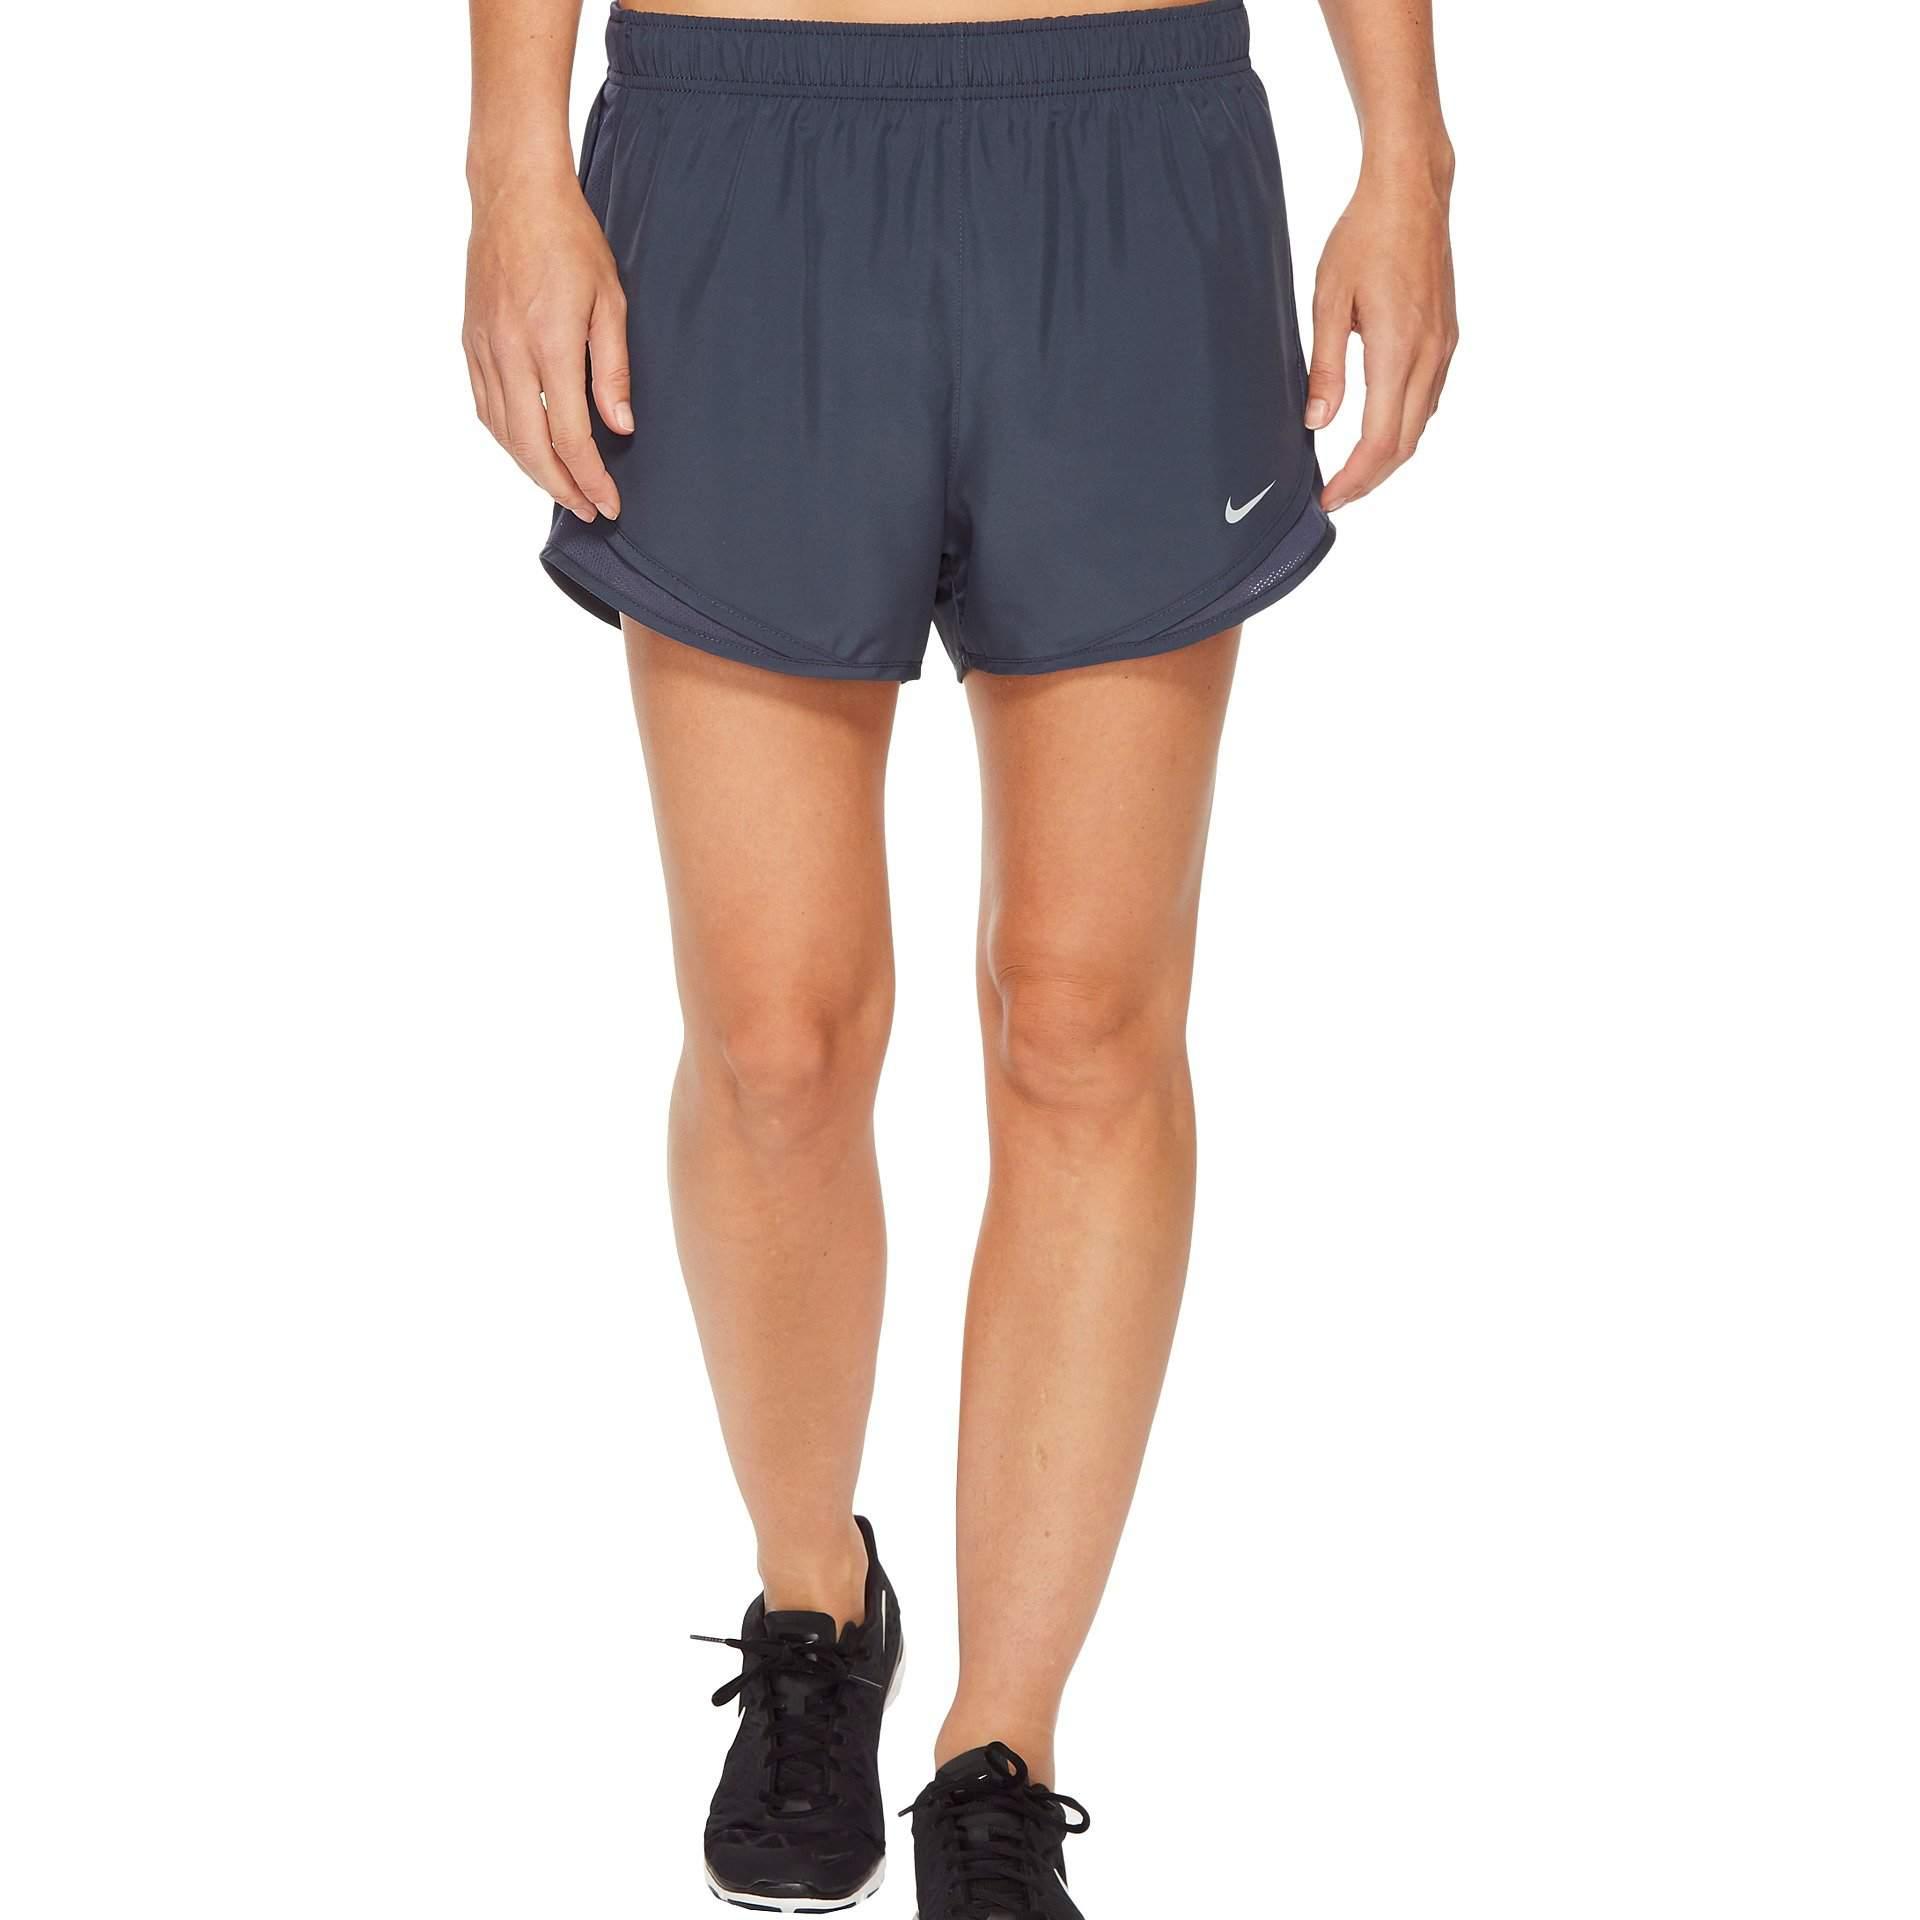 Pantalones cortos de running Nike Dry Tempo de 3 pulgadas para mujer